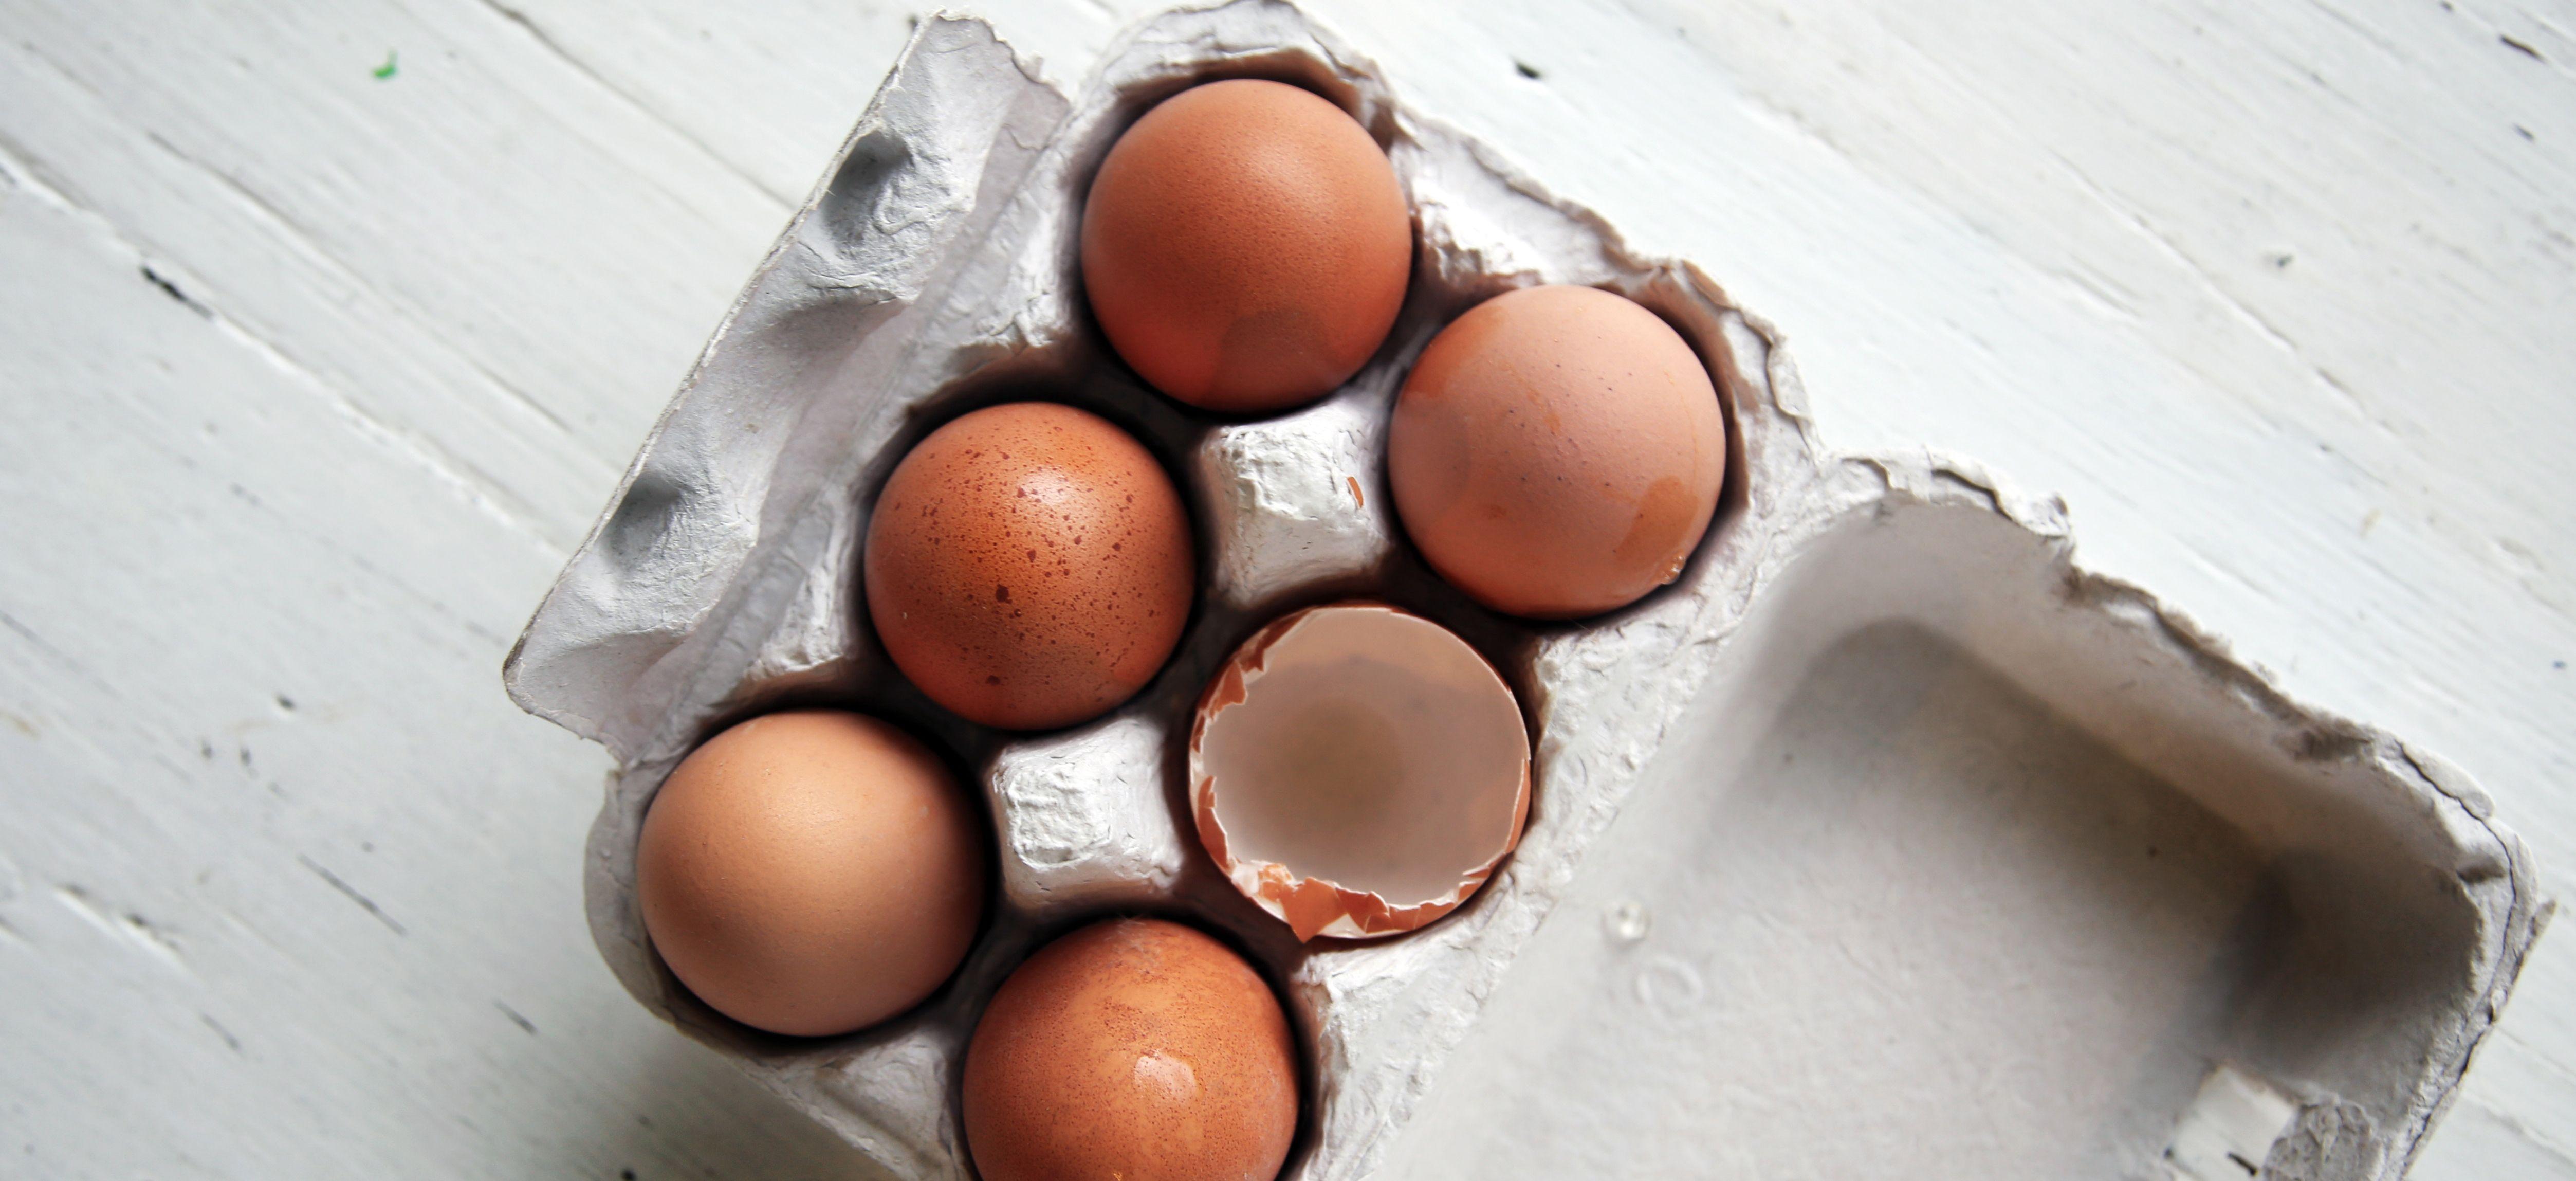 Kun je rauwe eieren invriezen?